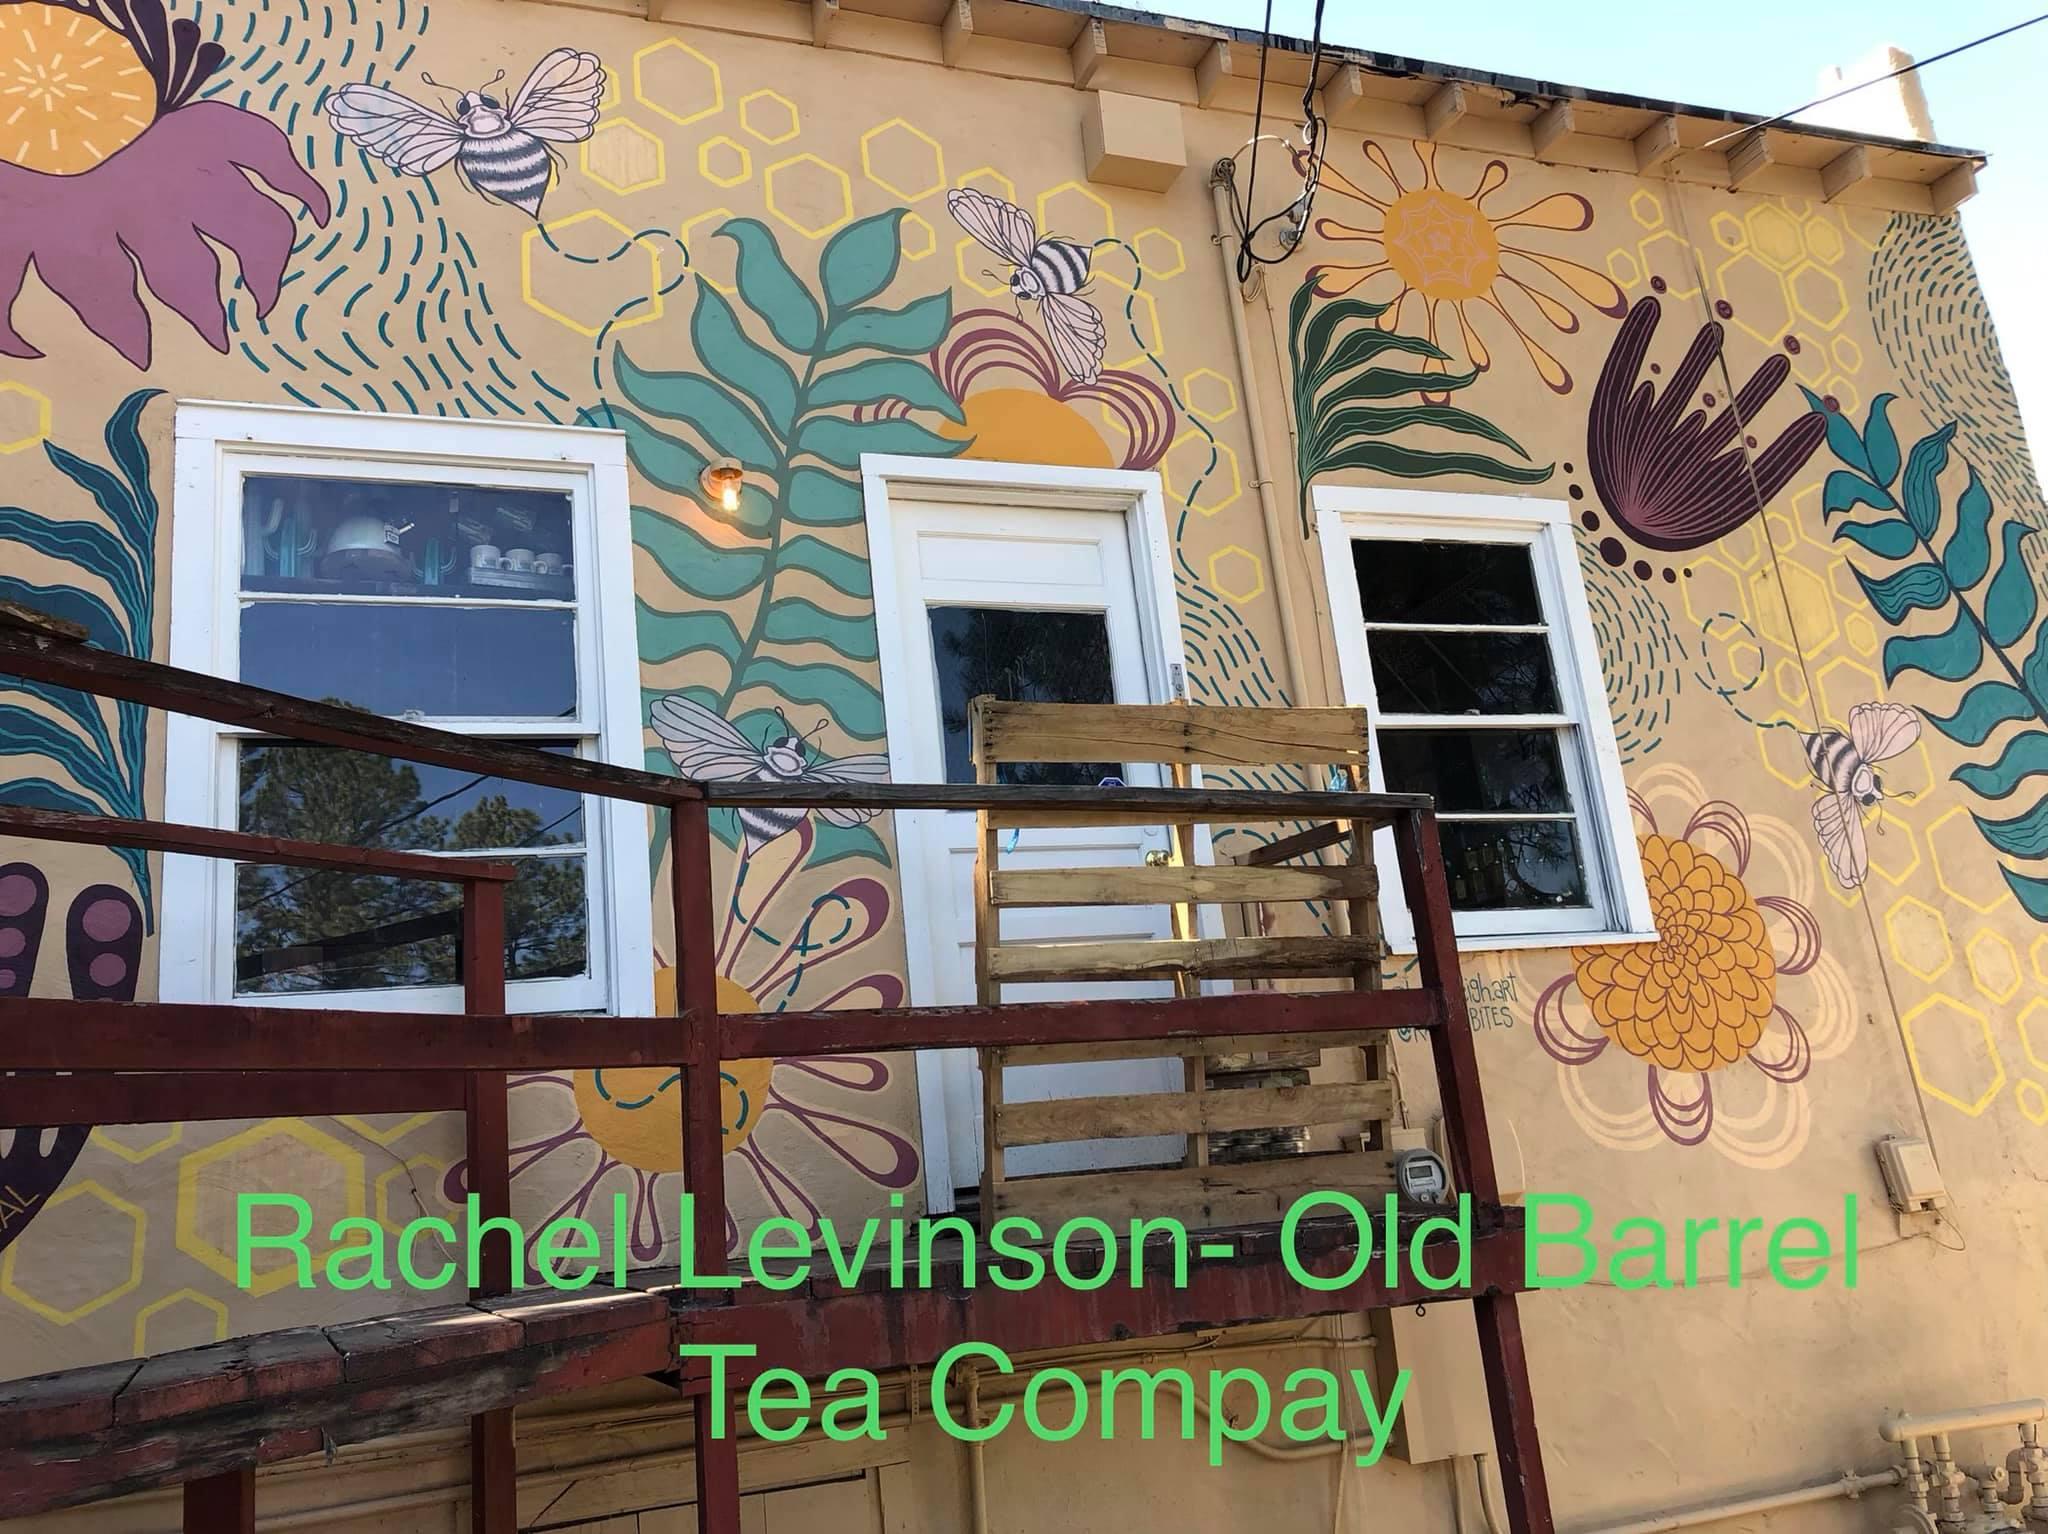 Photo: Mural at Old Barrel Tea & Spice